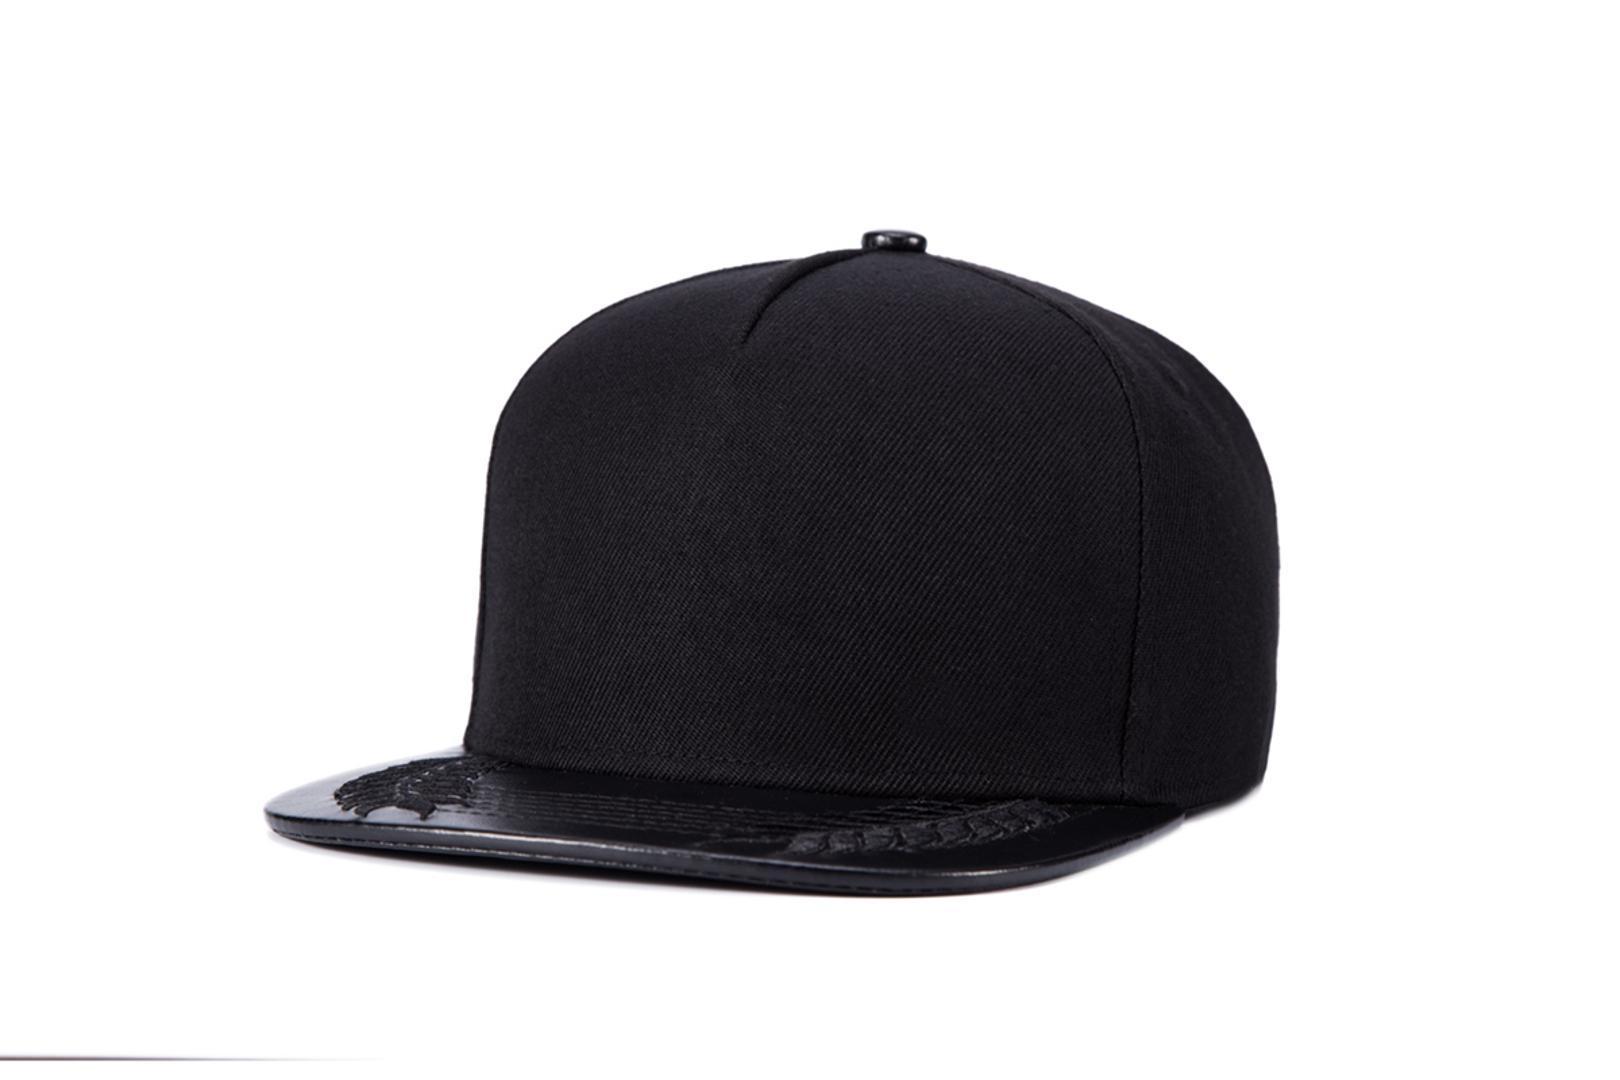 c9f5dfe7a17 2018 Gorras Planas Hot Style Flower Print Flat Top Hat Baseball Cap Hip Hop  Cap Hat For Man Swag Mens Snapbacks Black Compton Cap Baseball Caps For  Women ...